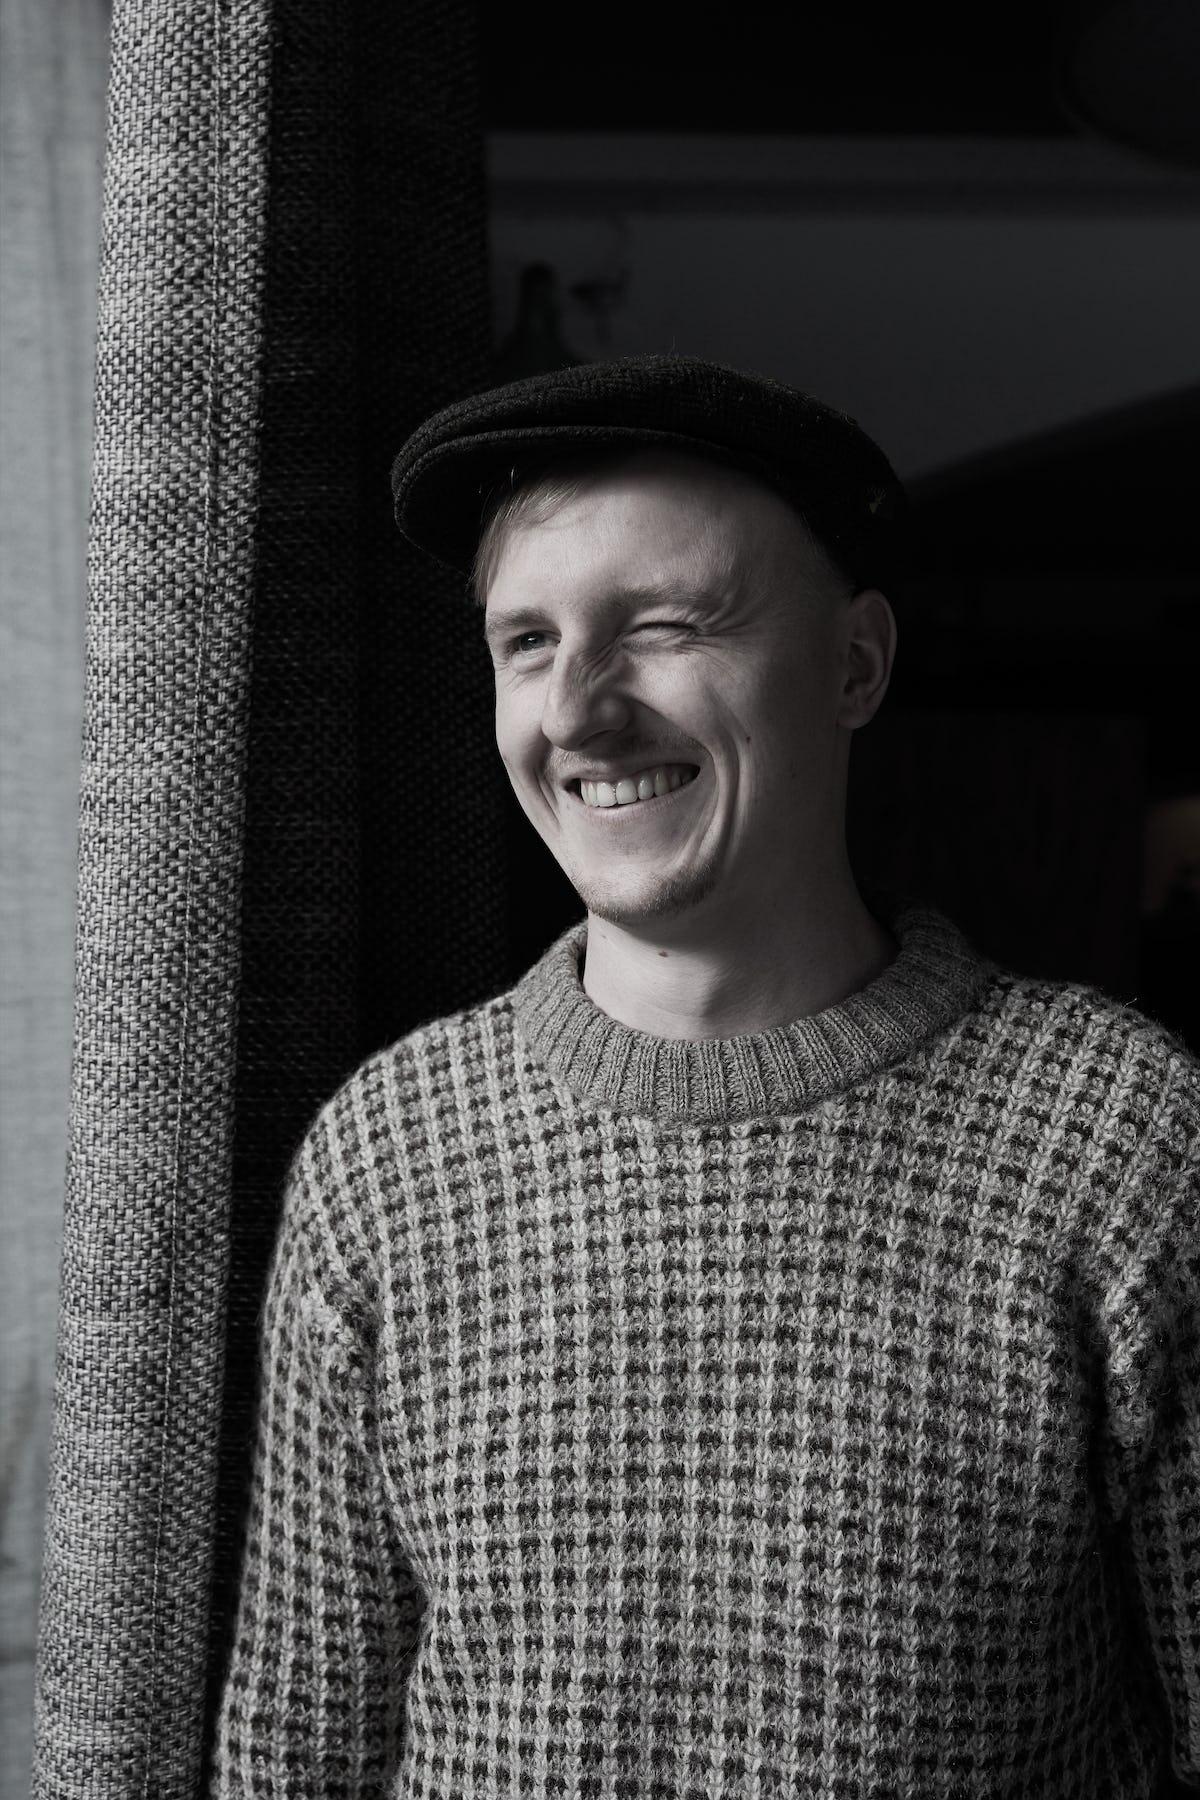 David Wolkerstorfer